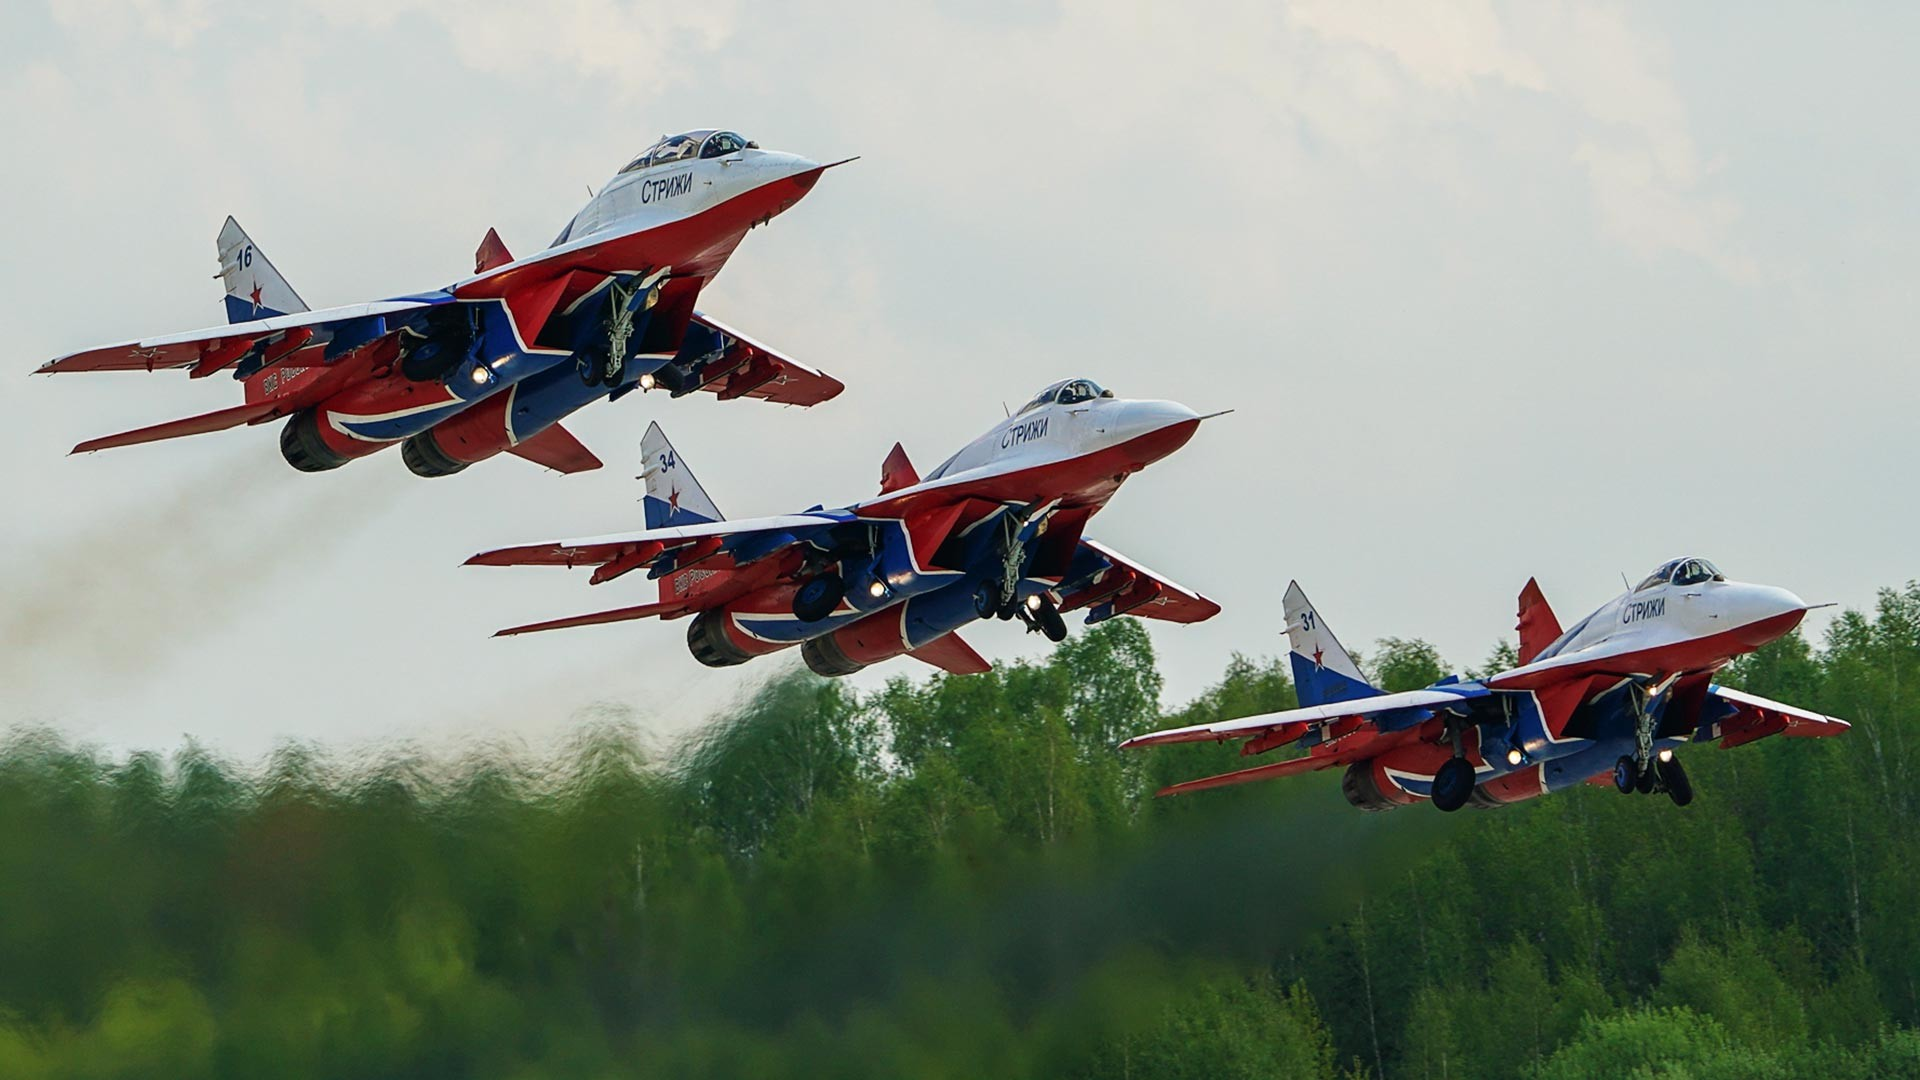 Lovci MiG-29 pilotske grupe